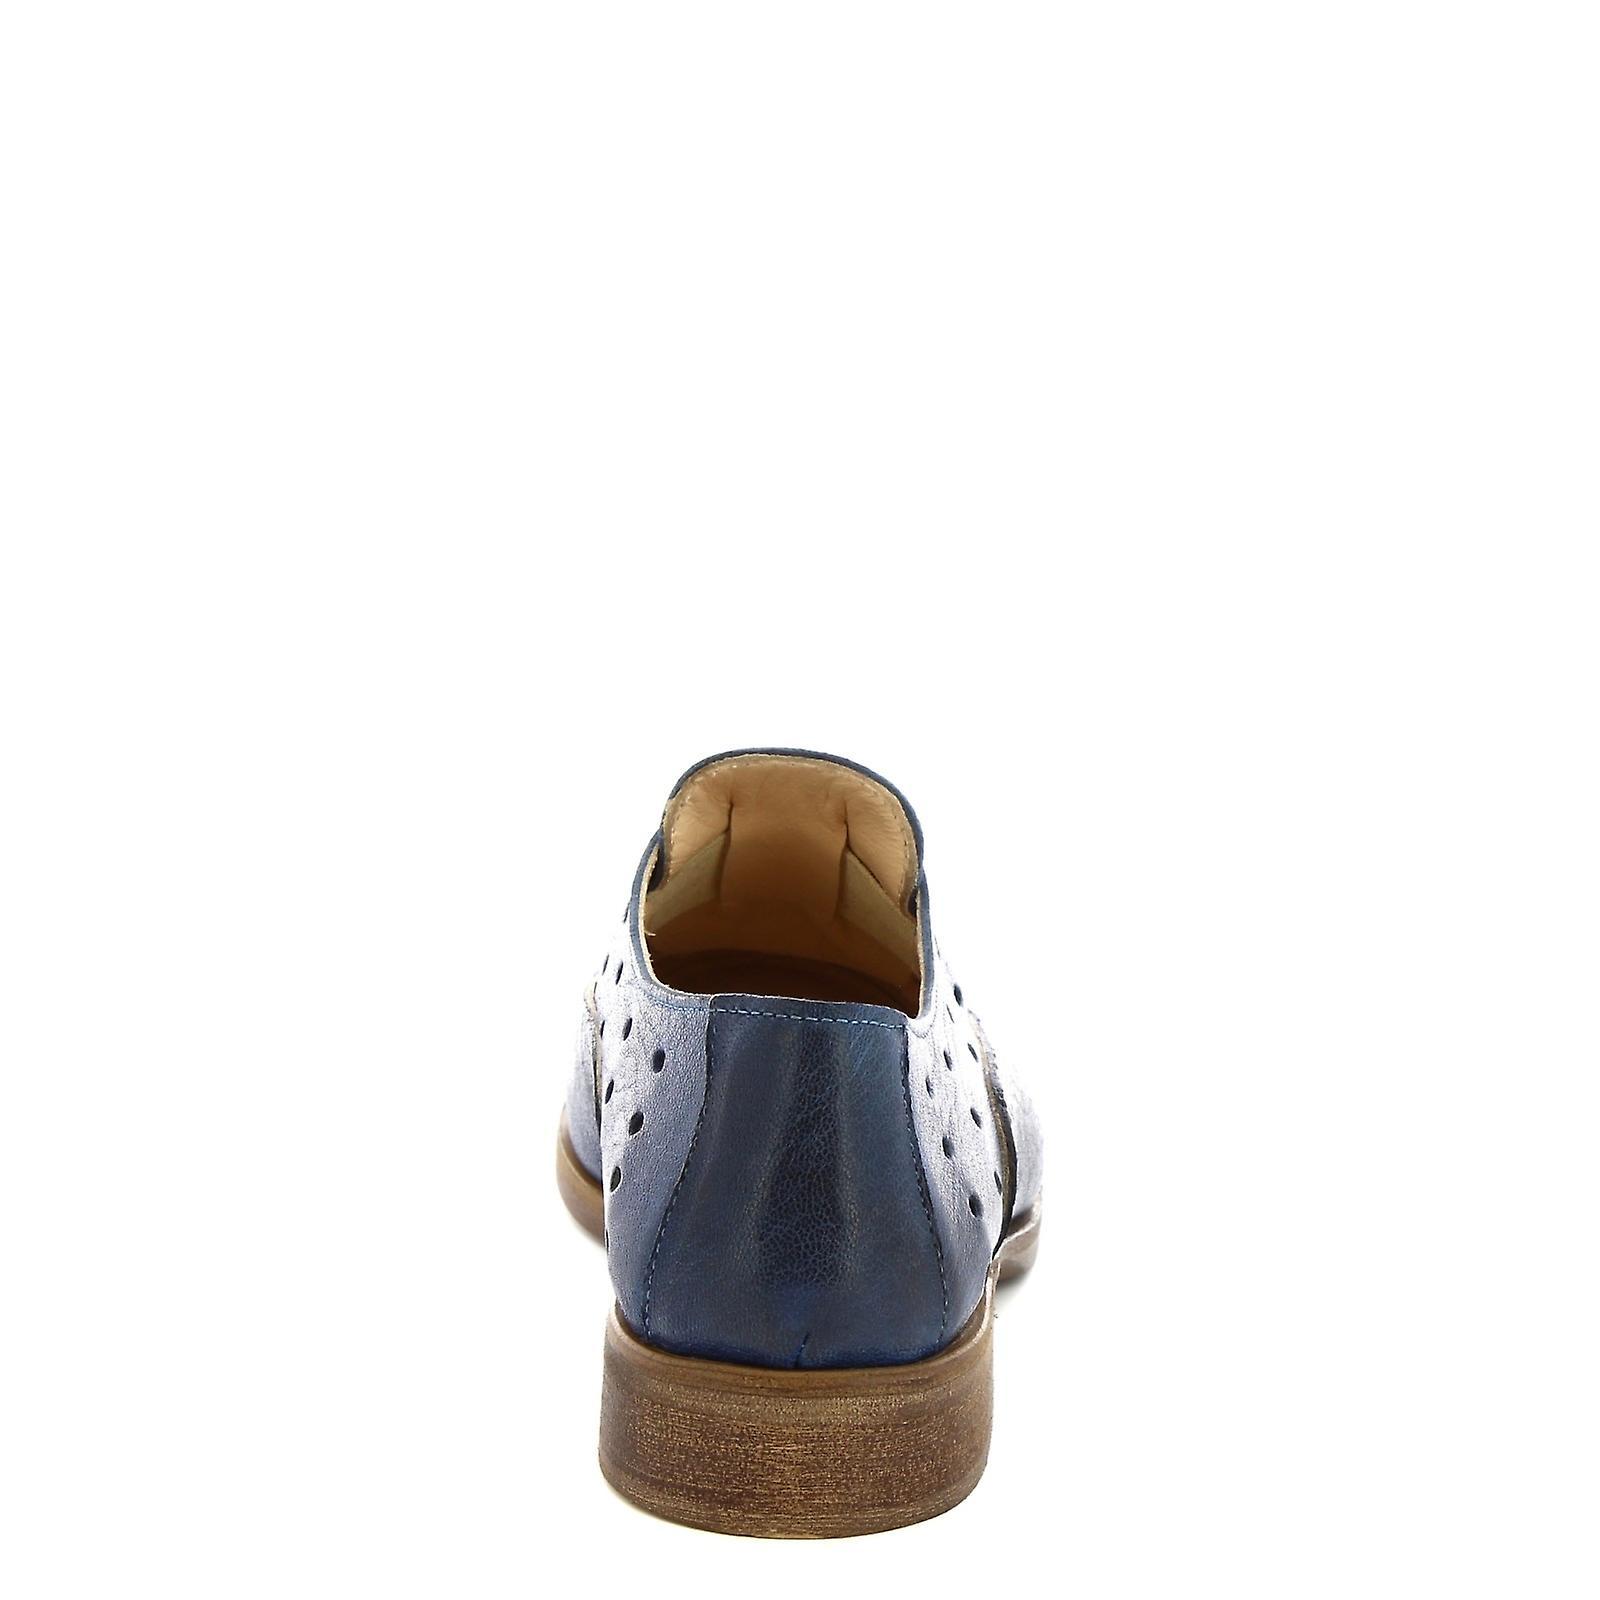 Leonardo Shoes Men's handmade laceless oxford shoes blue openwork calf leather